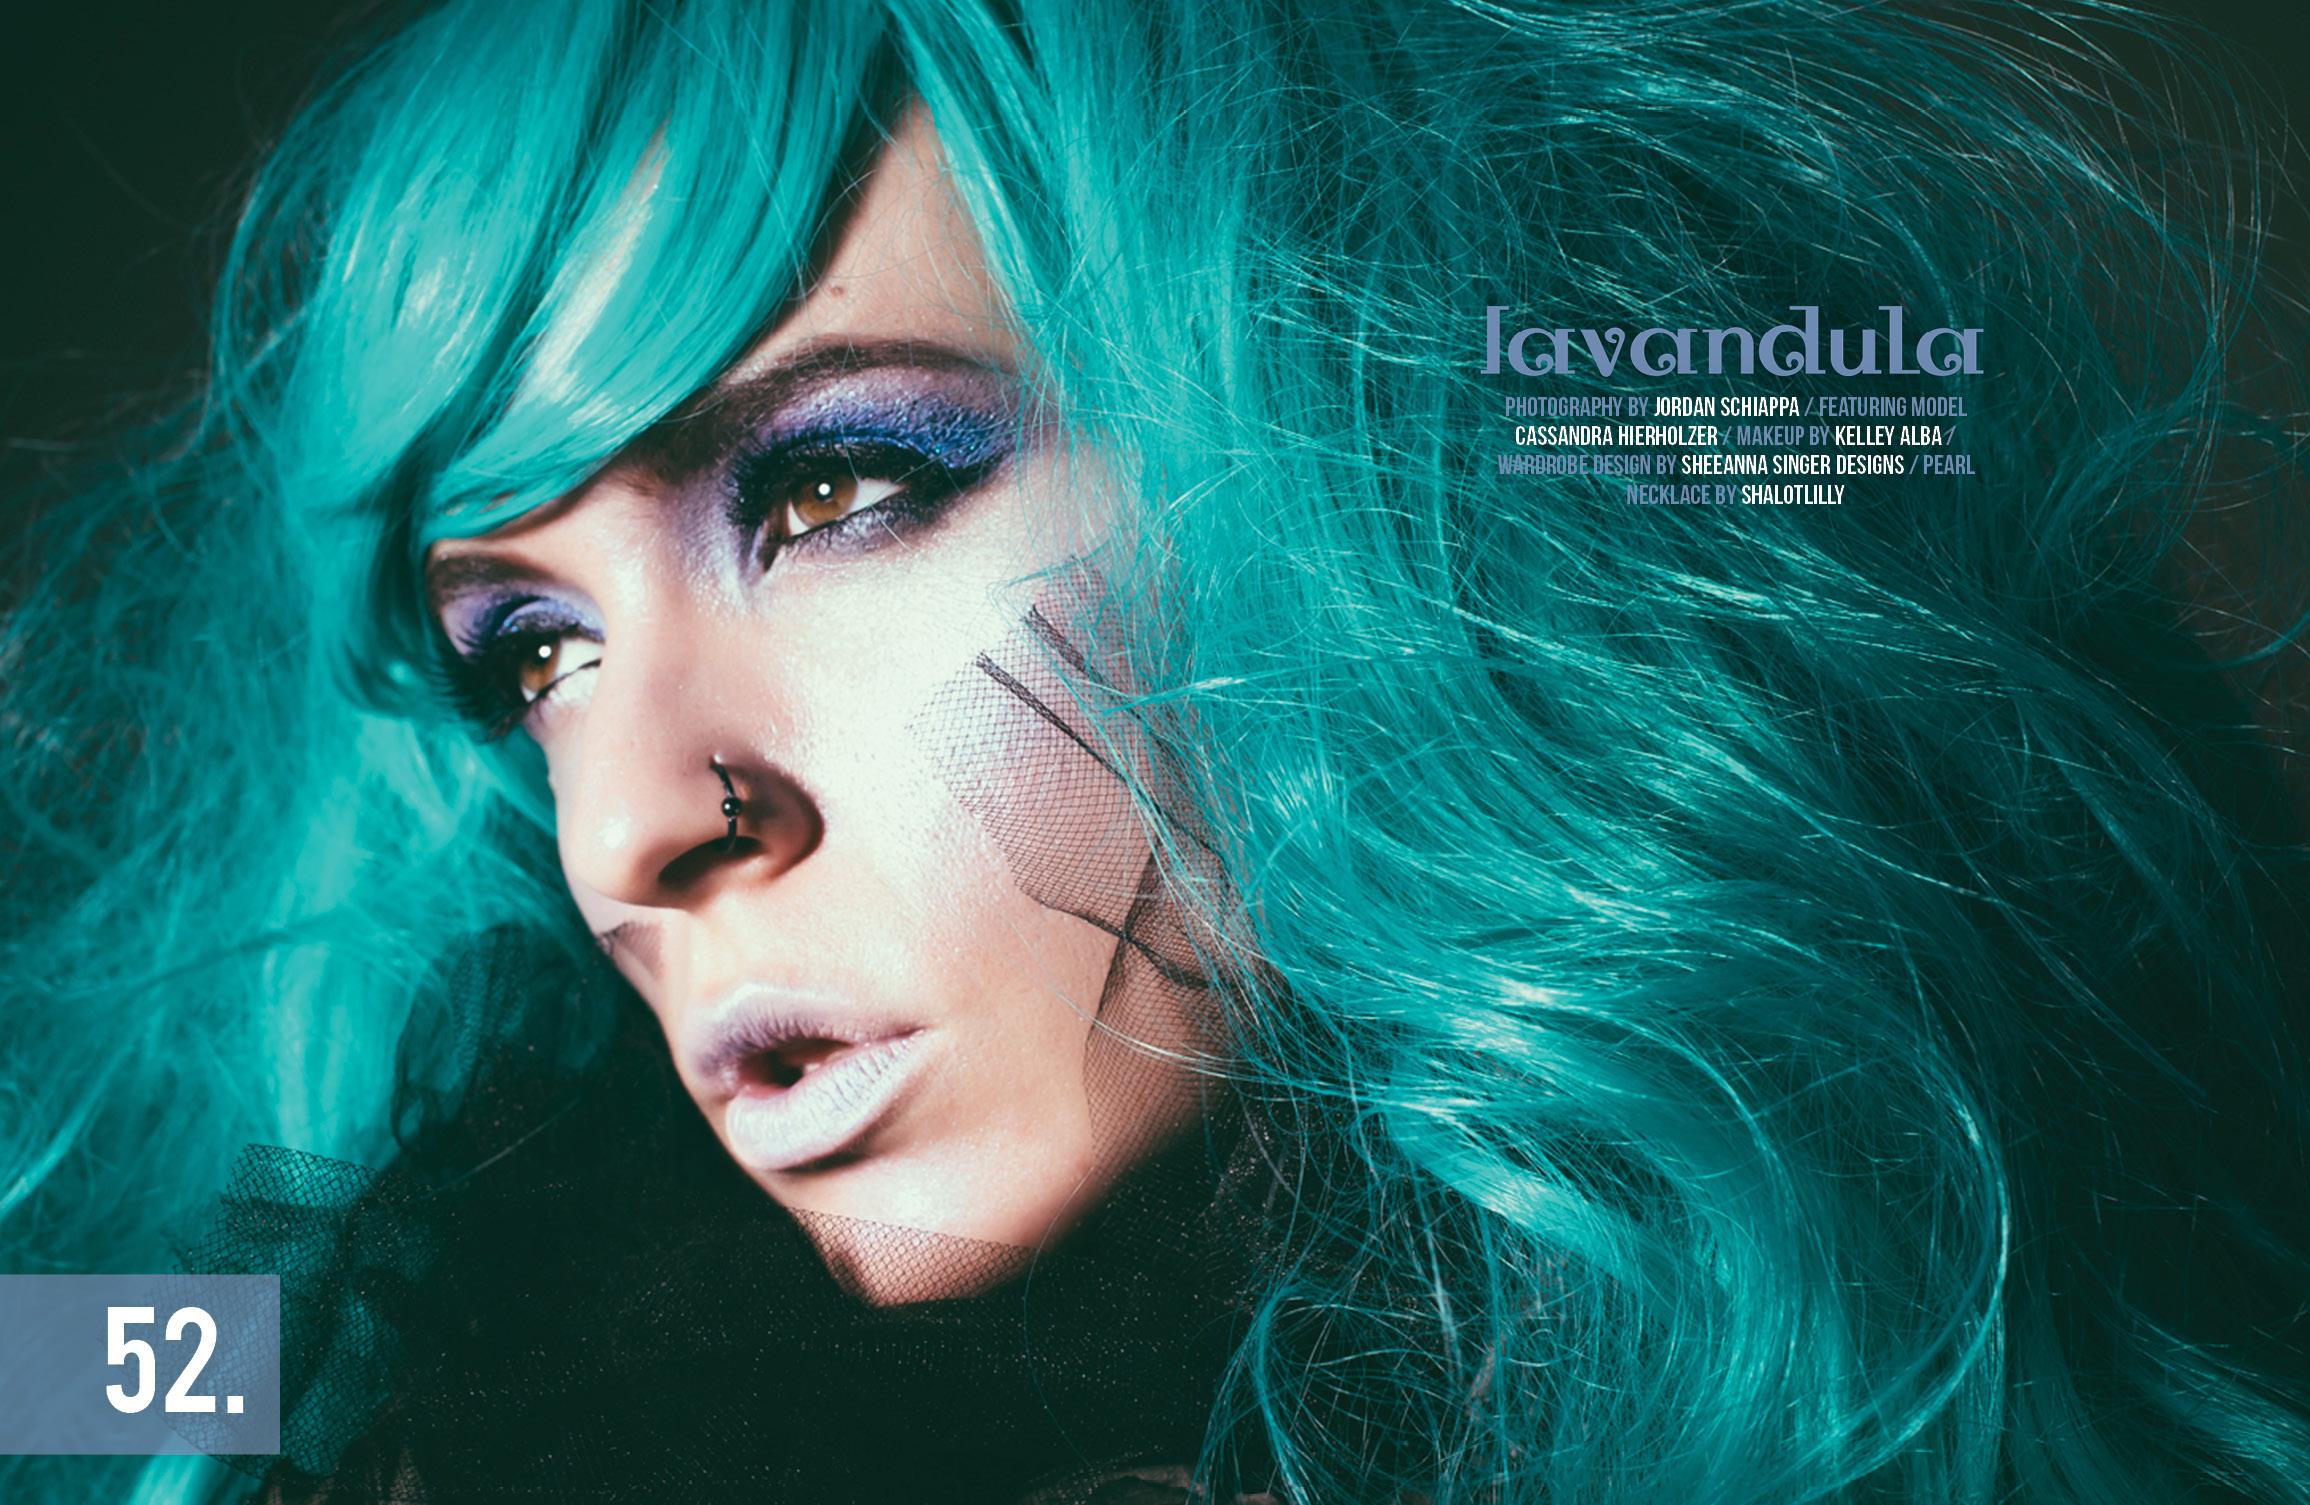 Gothesque Magazine